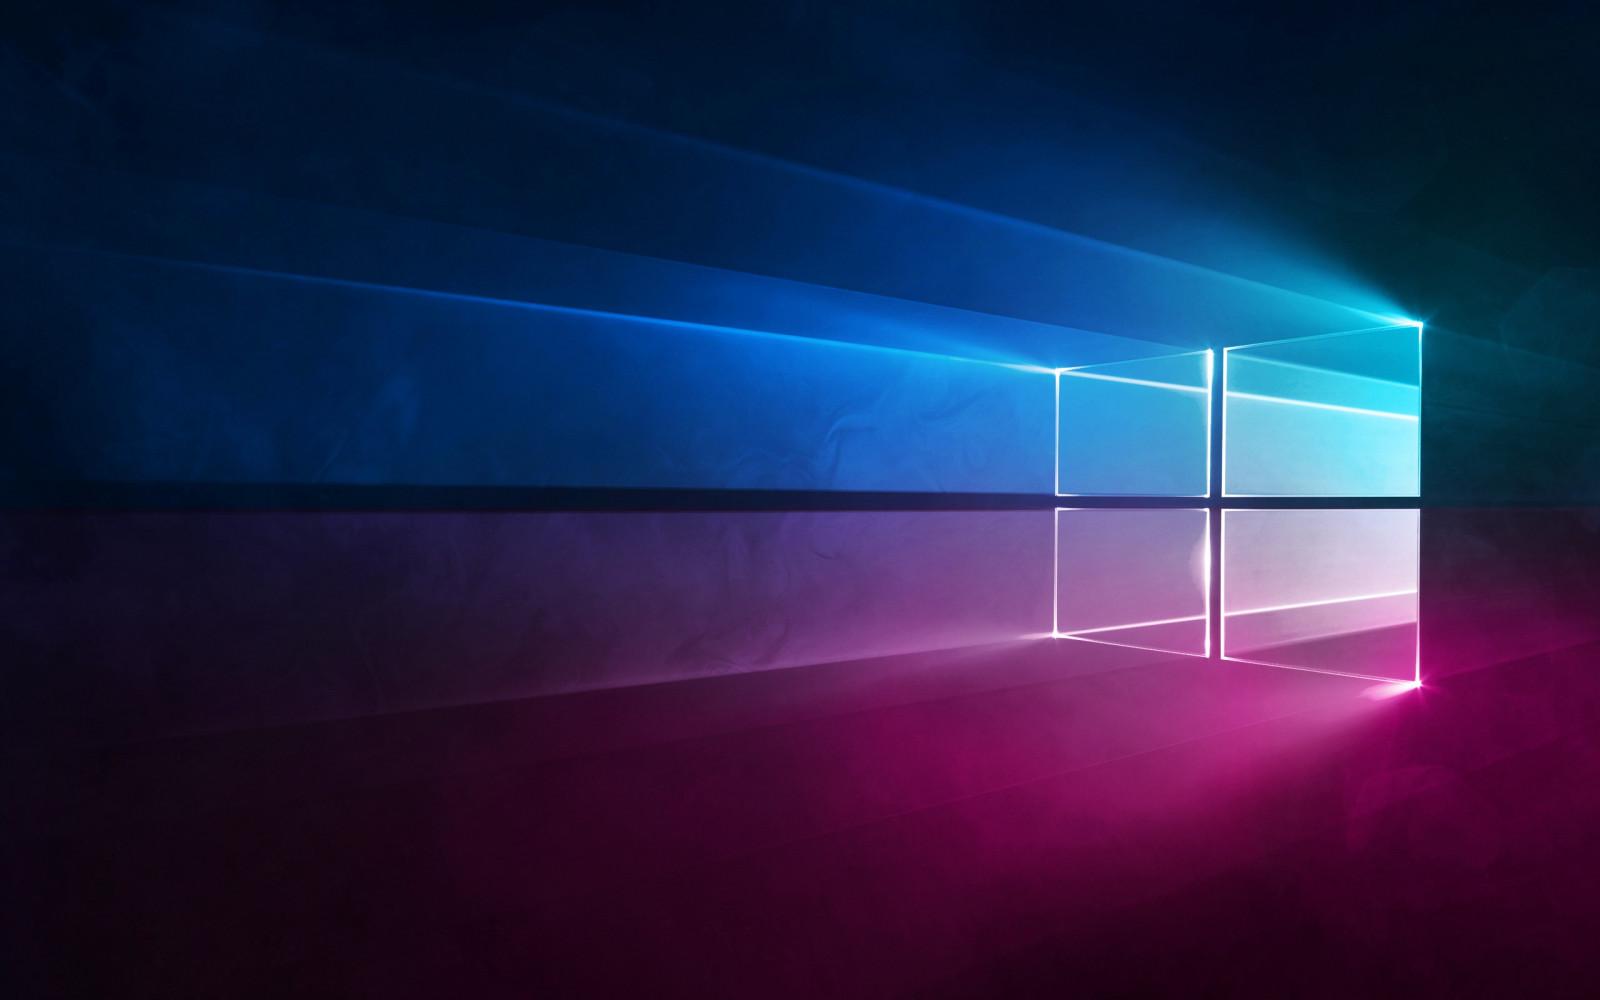 Wallpaper : Windows 10, Microsoft, gradient, blue, purple ...